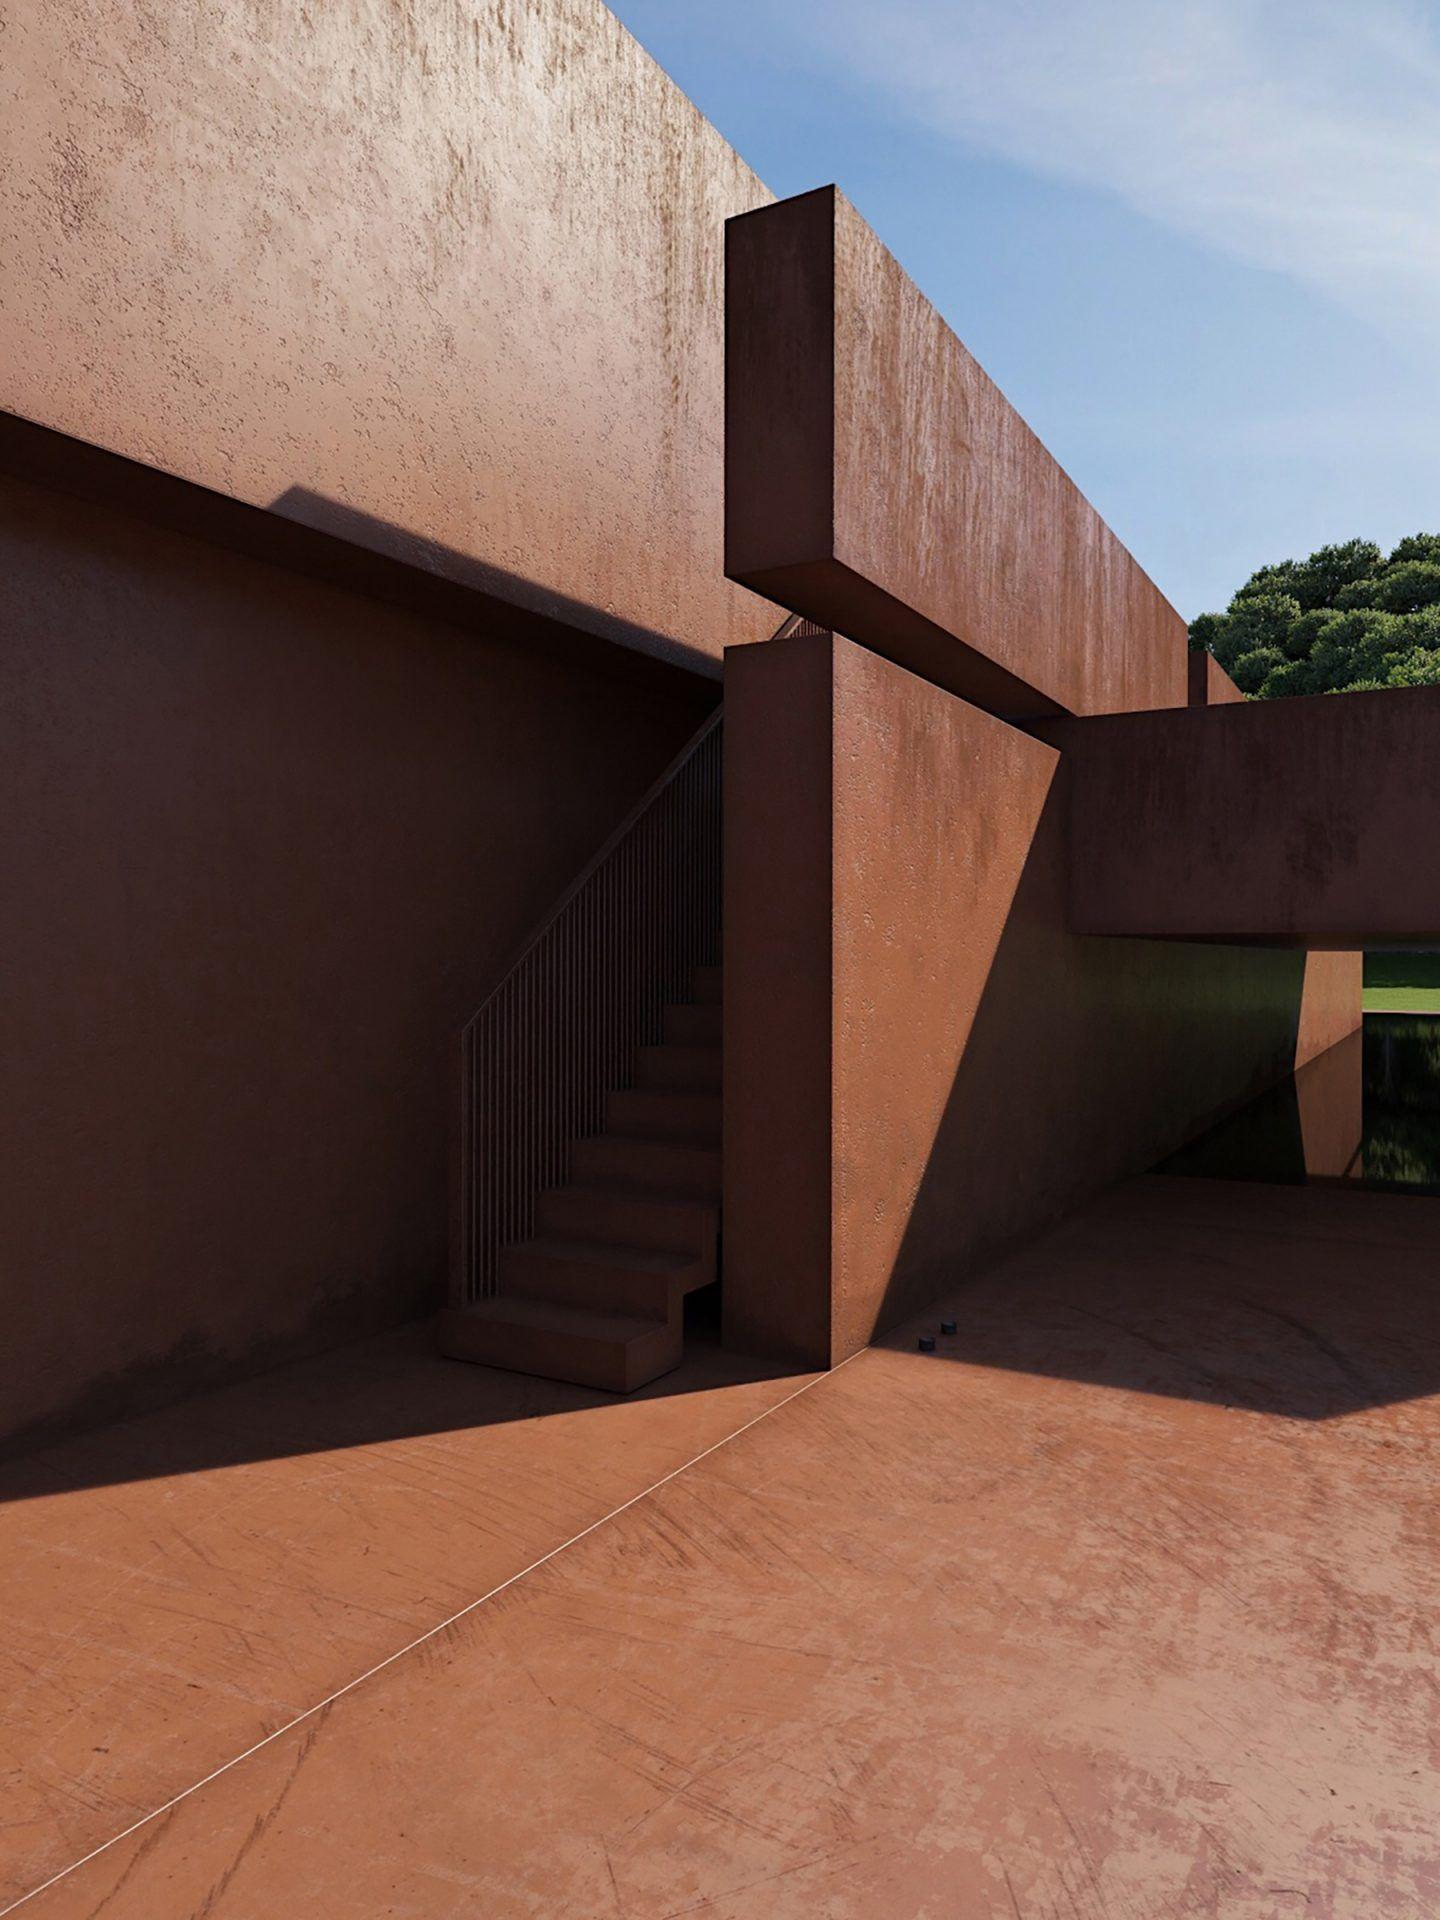 IGNANT-Architecture-SPRW-Architects-Flatness-07